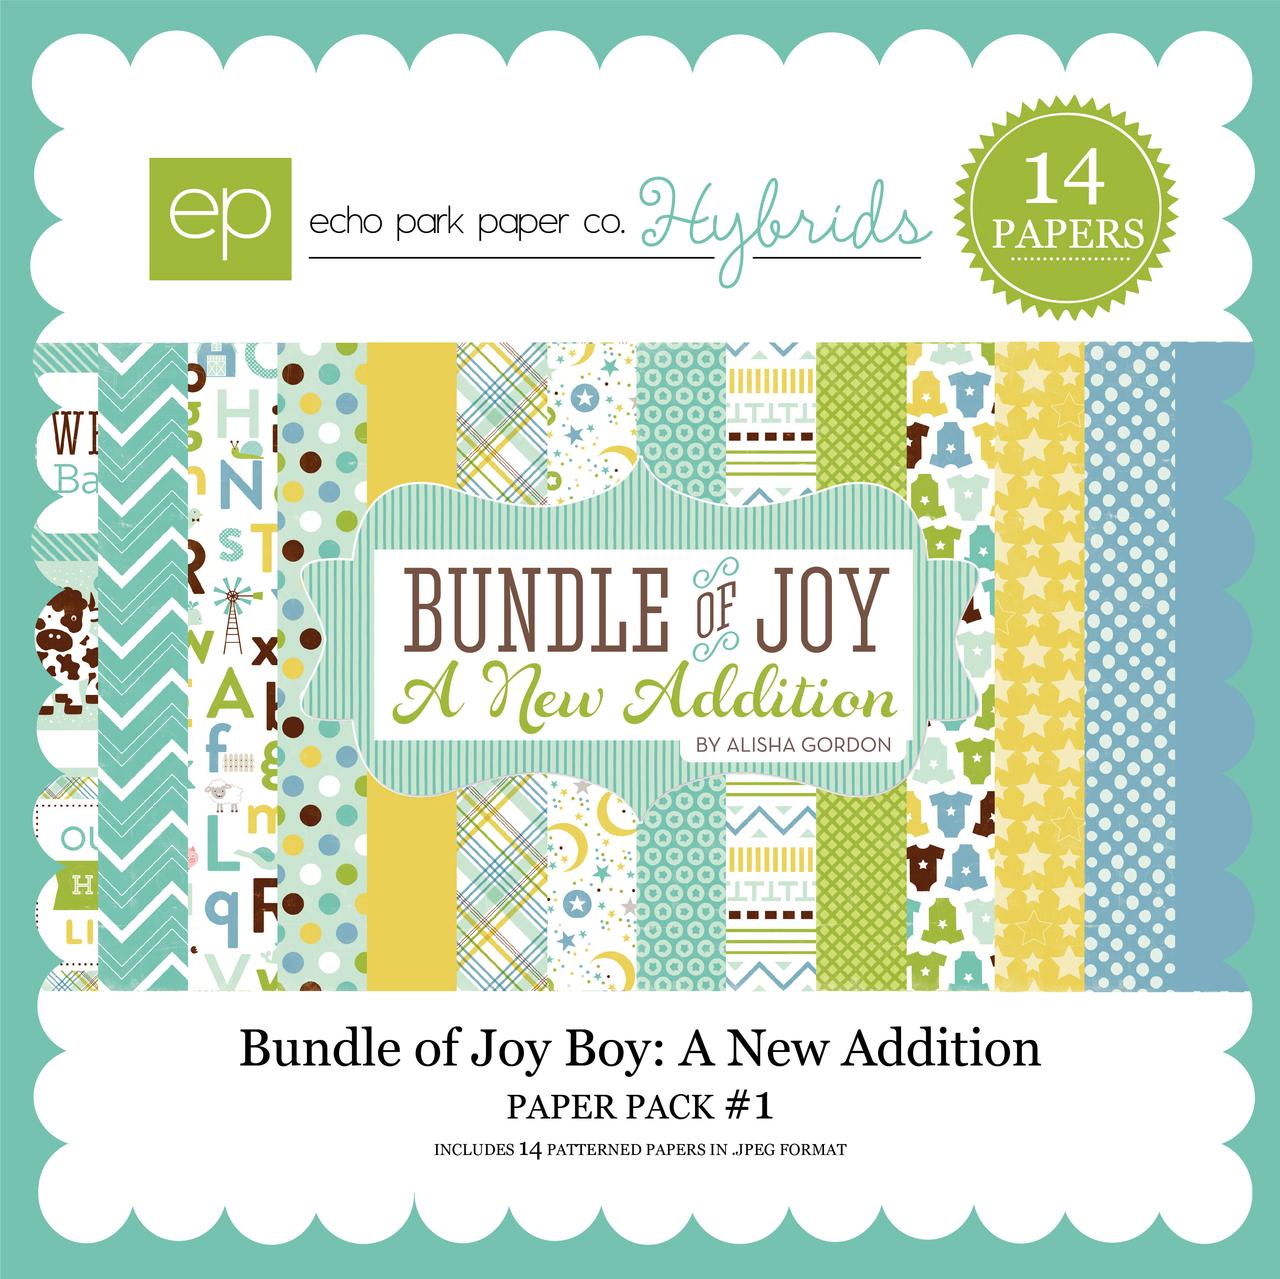 Bundle of Joy Boy: A New Addition Paper Pack